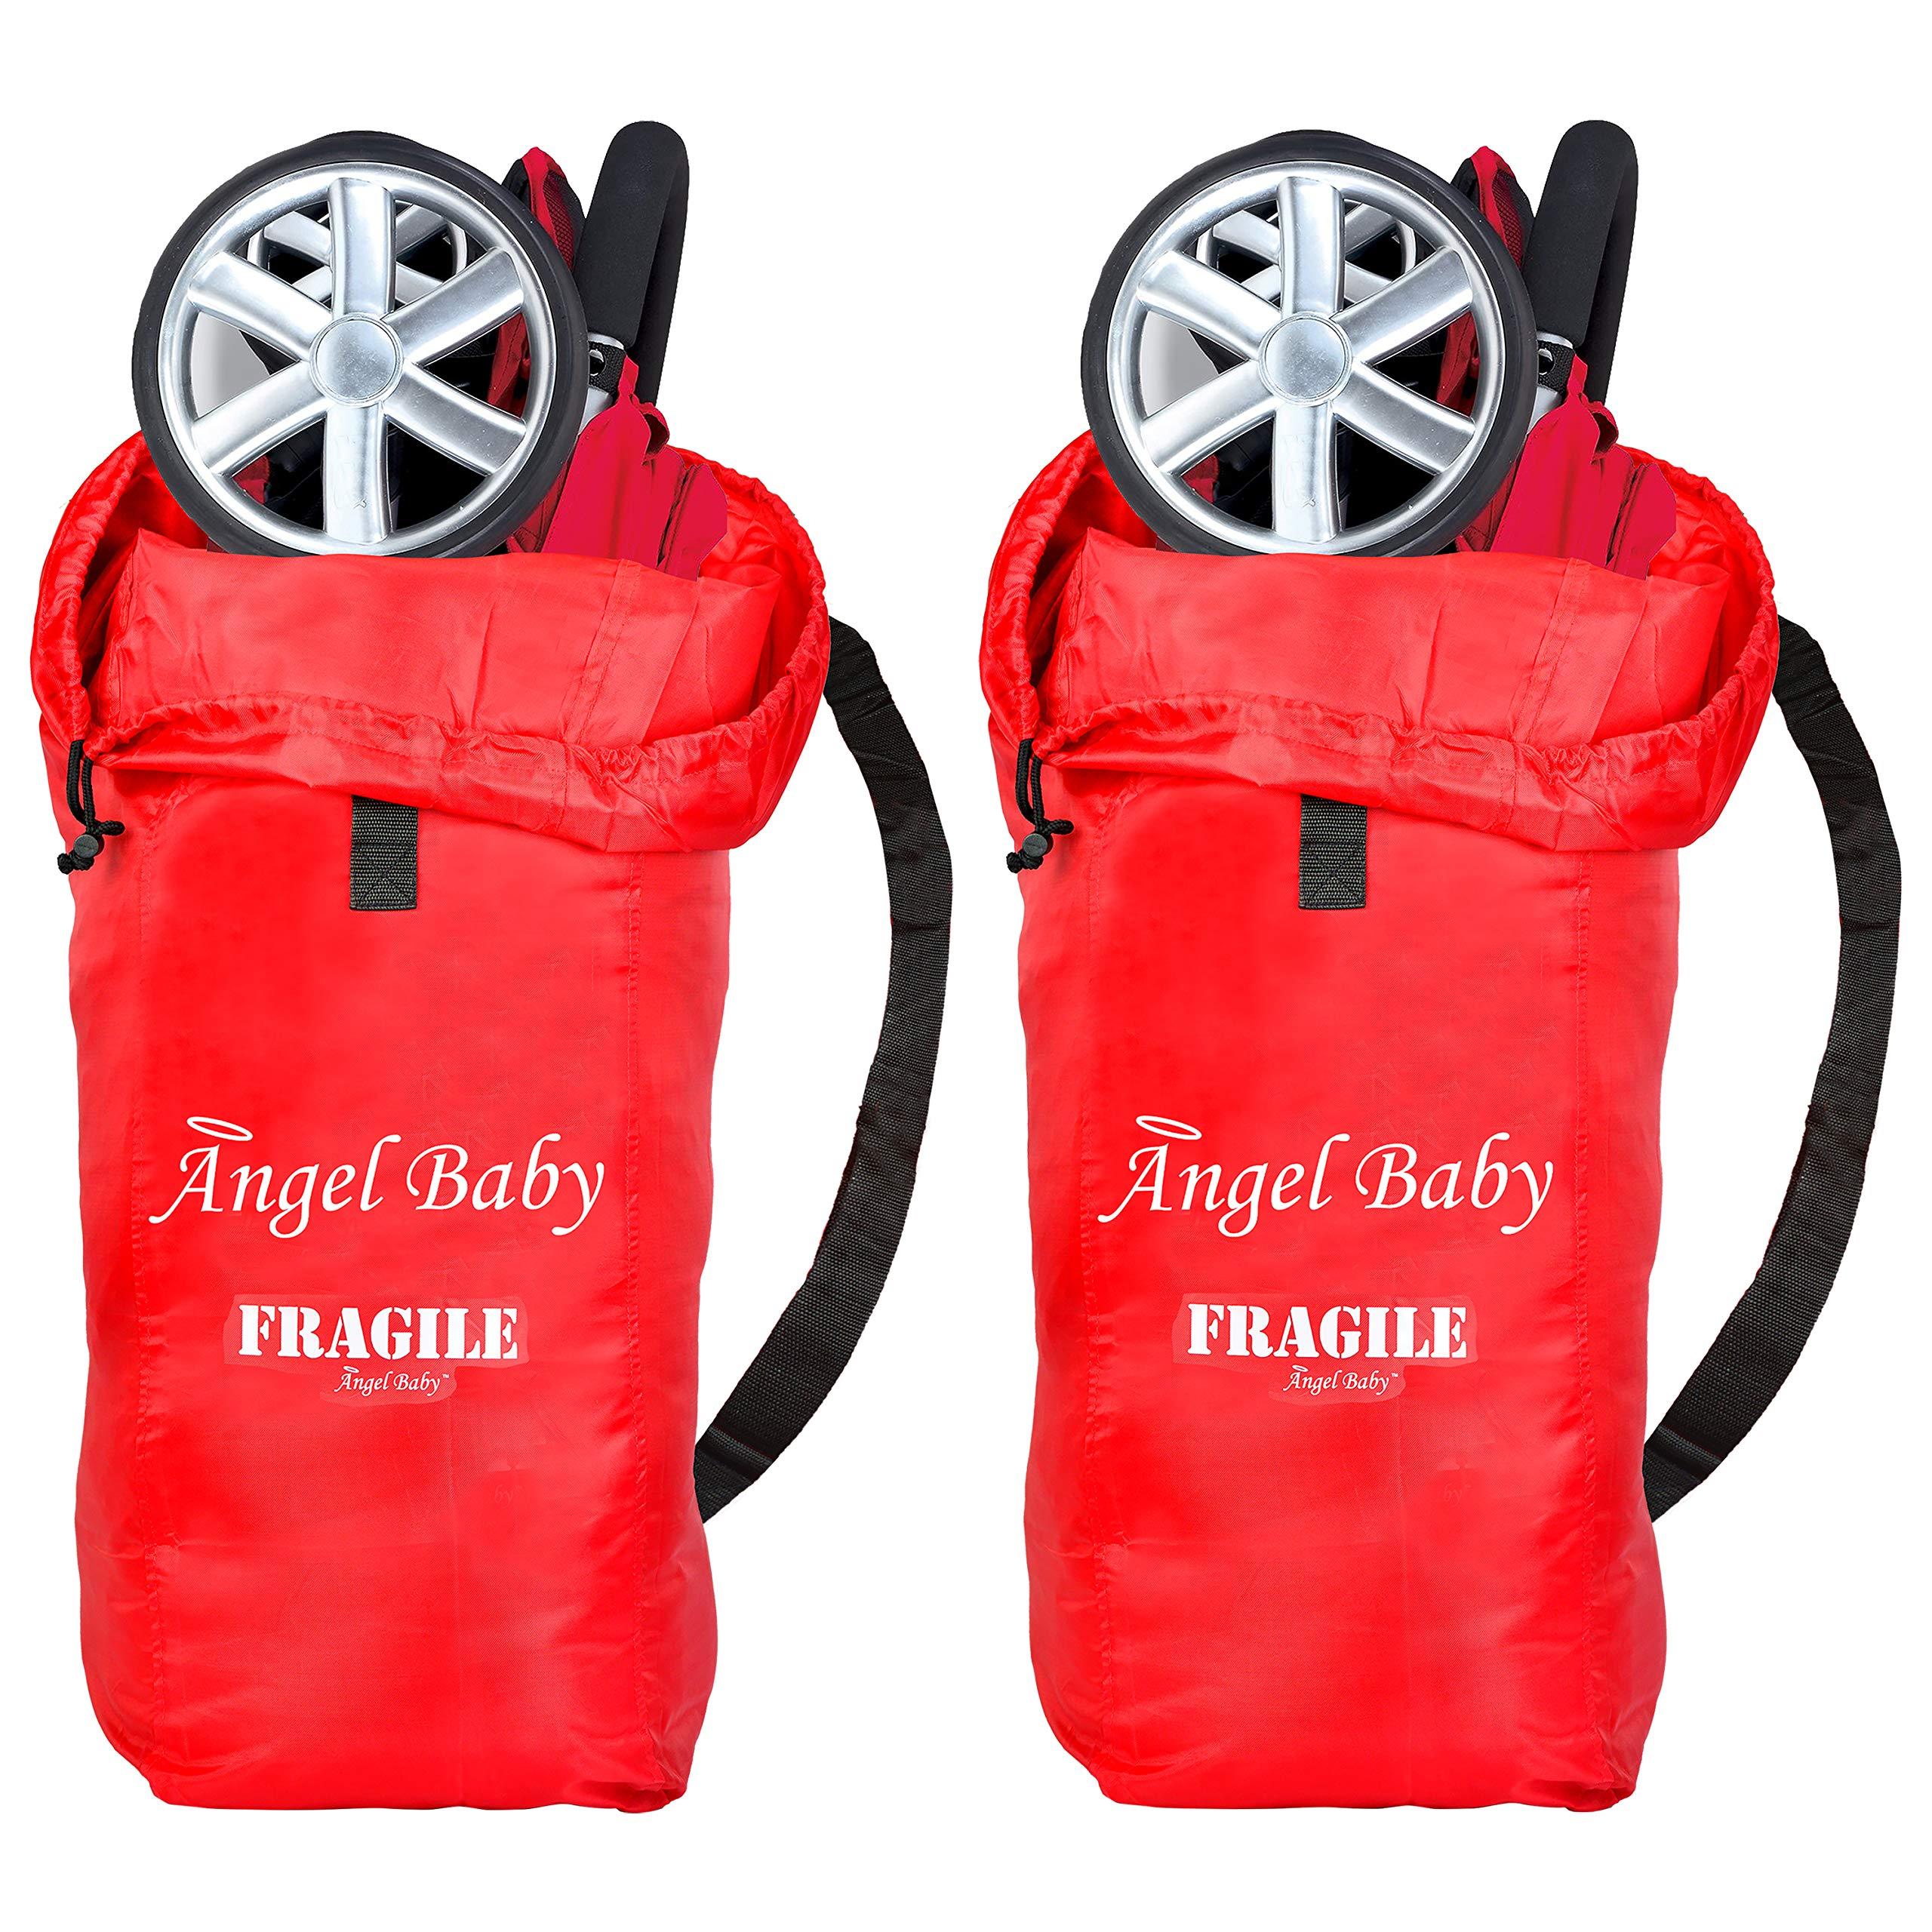 Angel Baby Stroller Travel Bag for Airplane 2pk: Stroller Gate Check Bag Cover